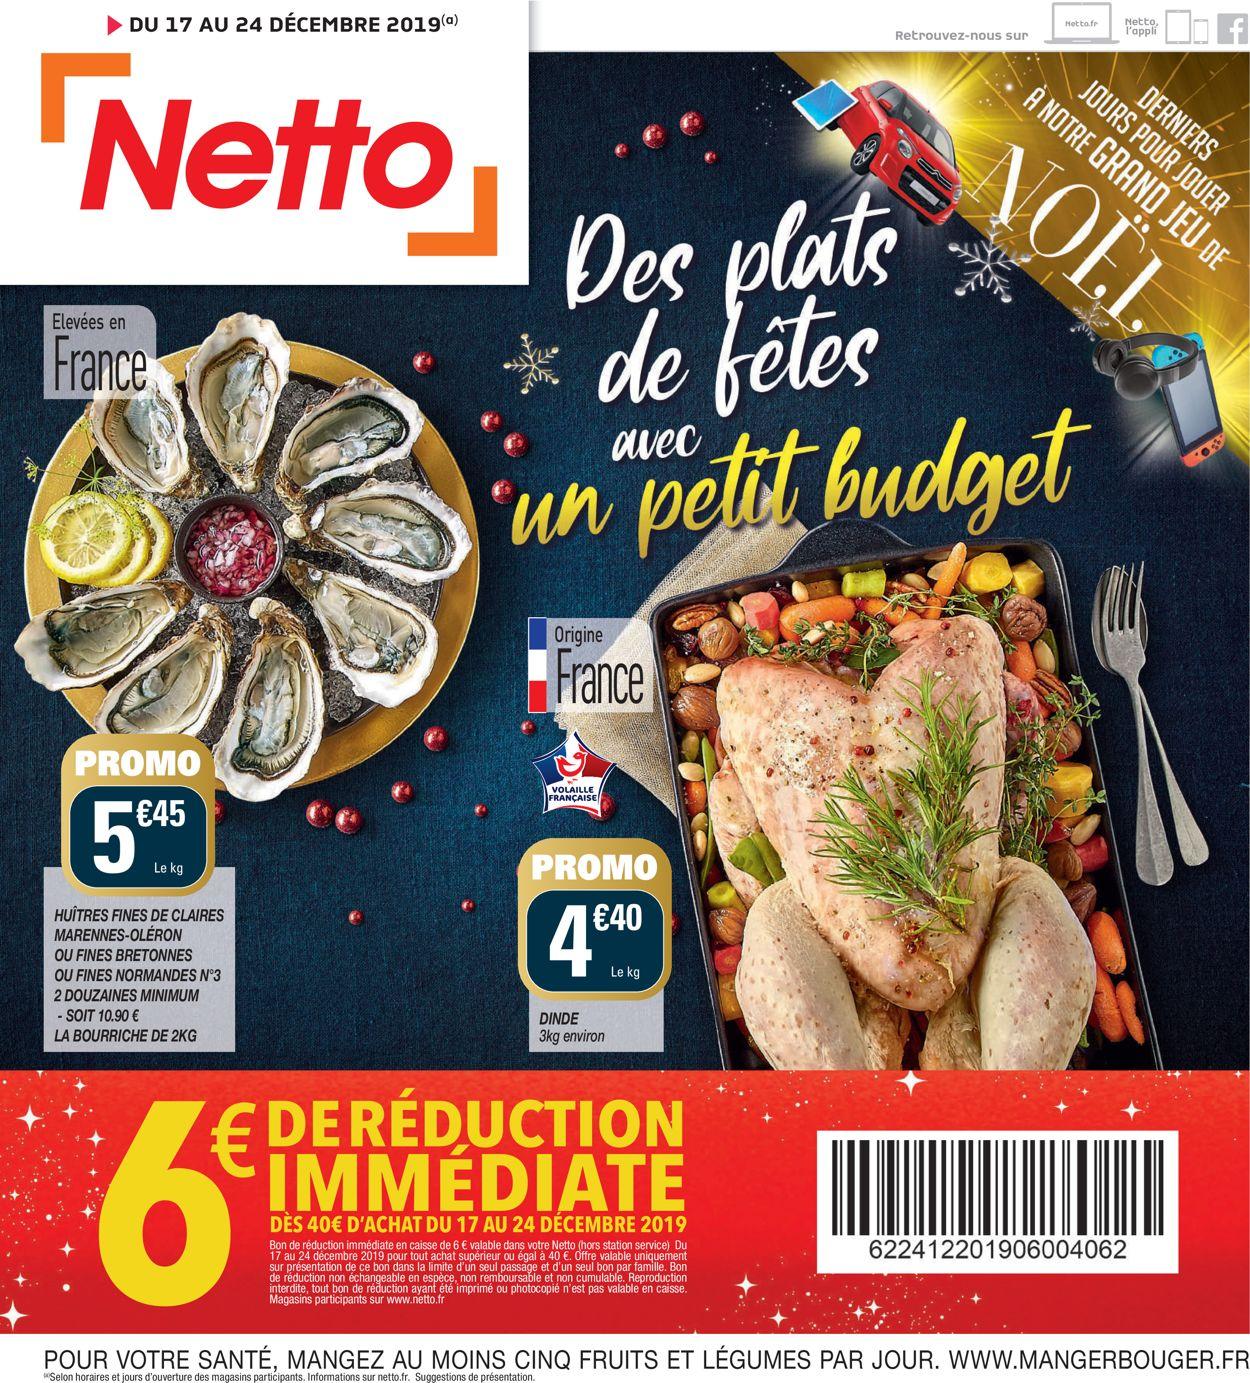 Netto - catalogue de Noël 2019 Catalogue - 17.12-24.12.2019